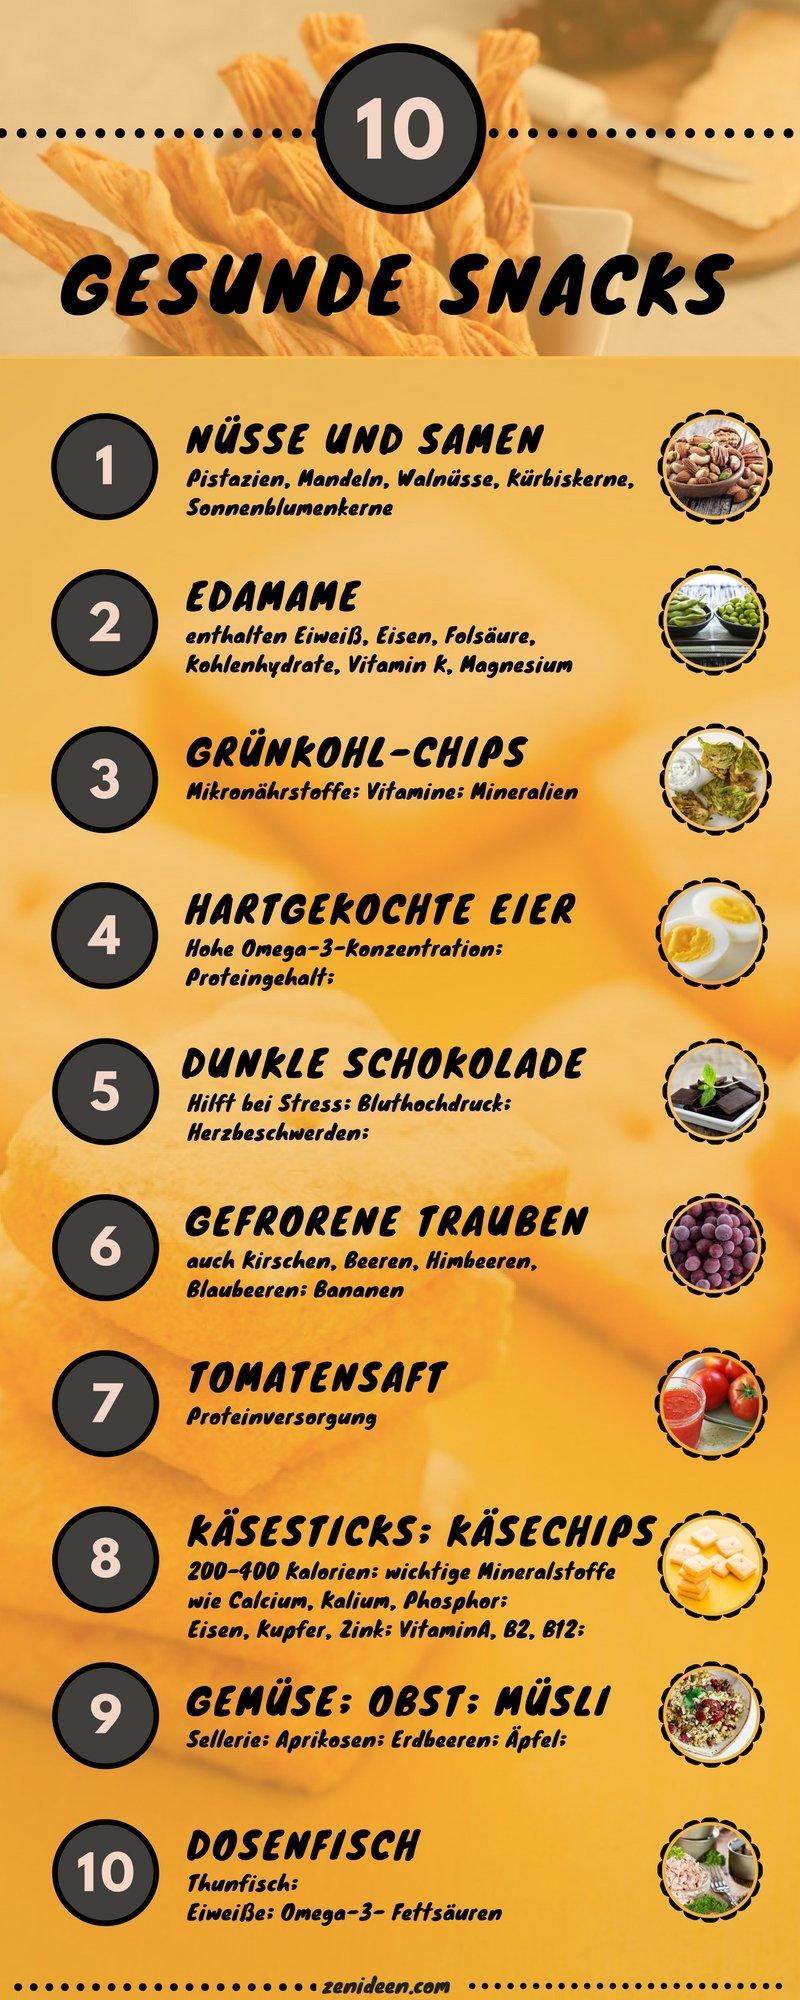 gesunde snacks infografik die 10 gesündesten snacks kalorienarme snacks